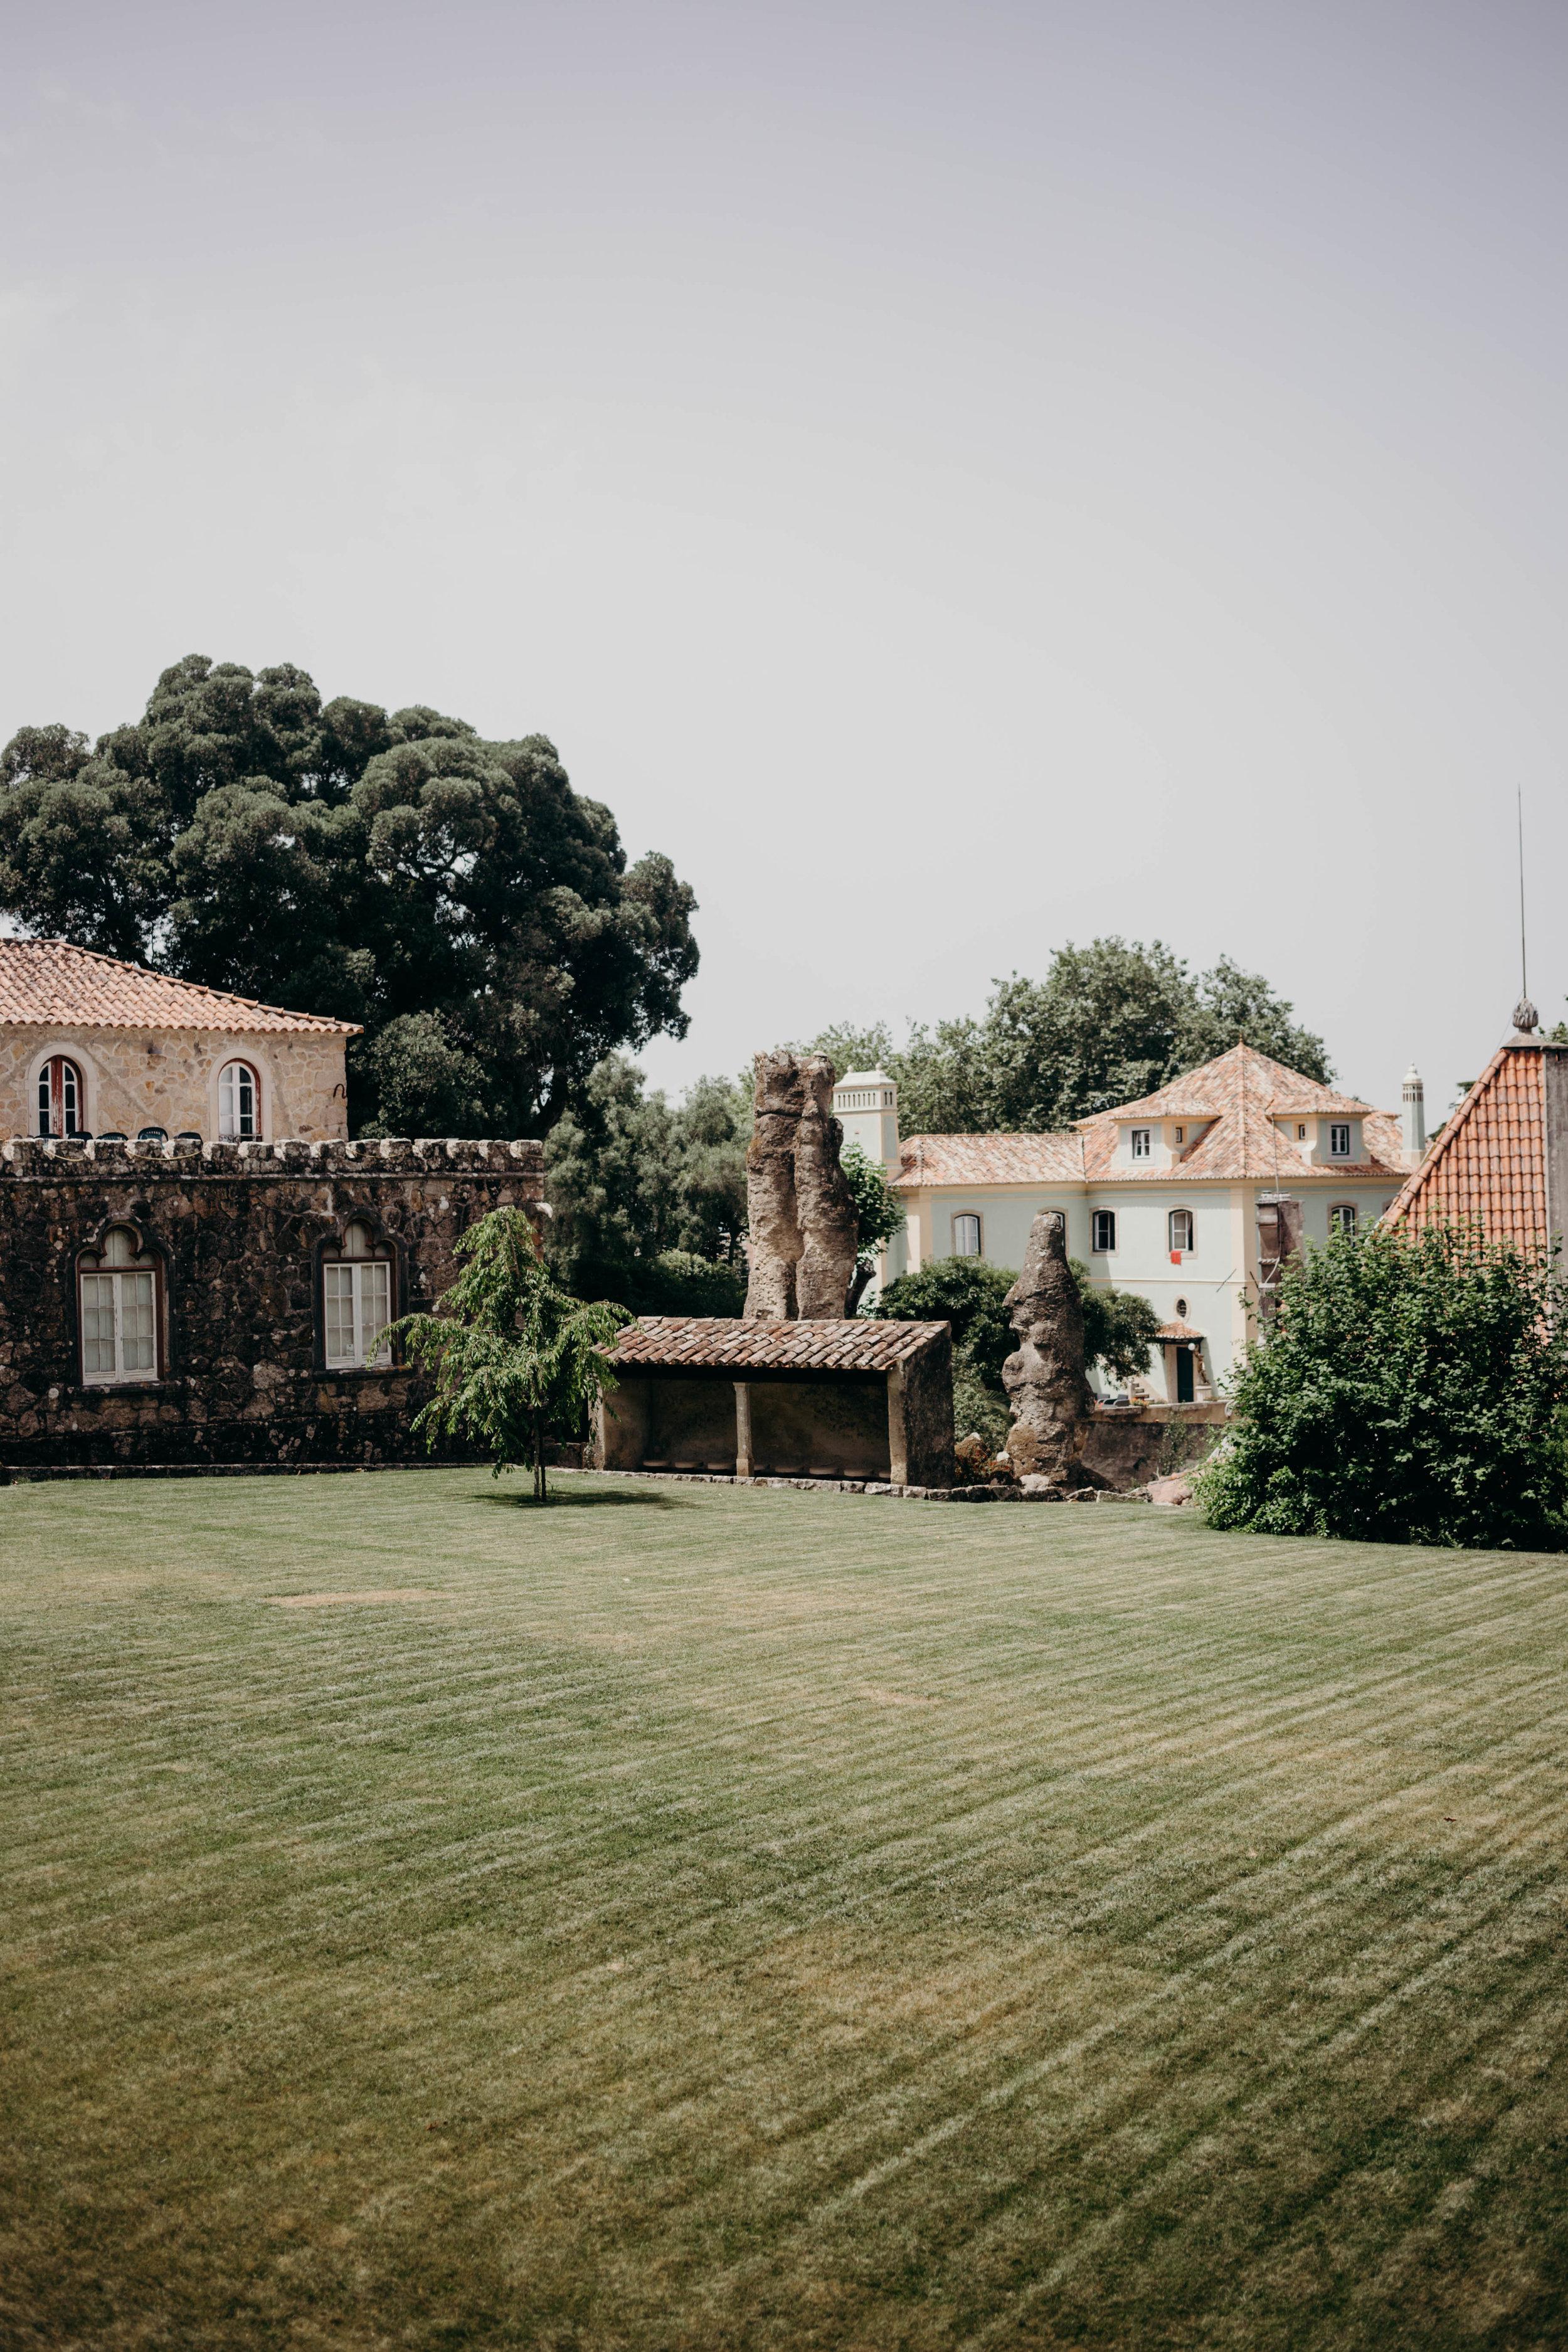 Our Portugal Travel Diary: Lisbon, Porto, and More | On the Street Where We Live (aretherelilactrees.com)  Sintra, Quinta da Regaleira